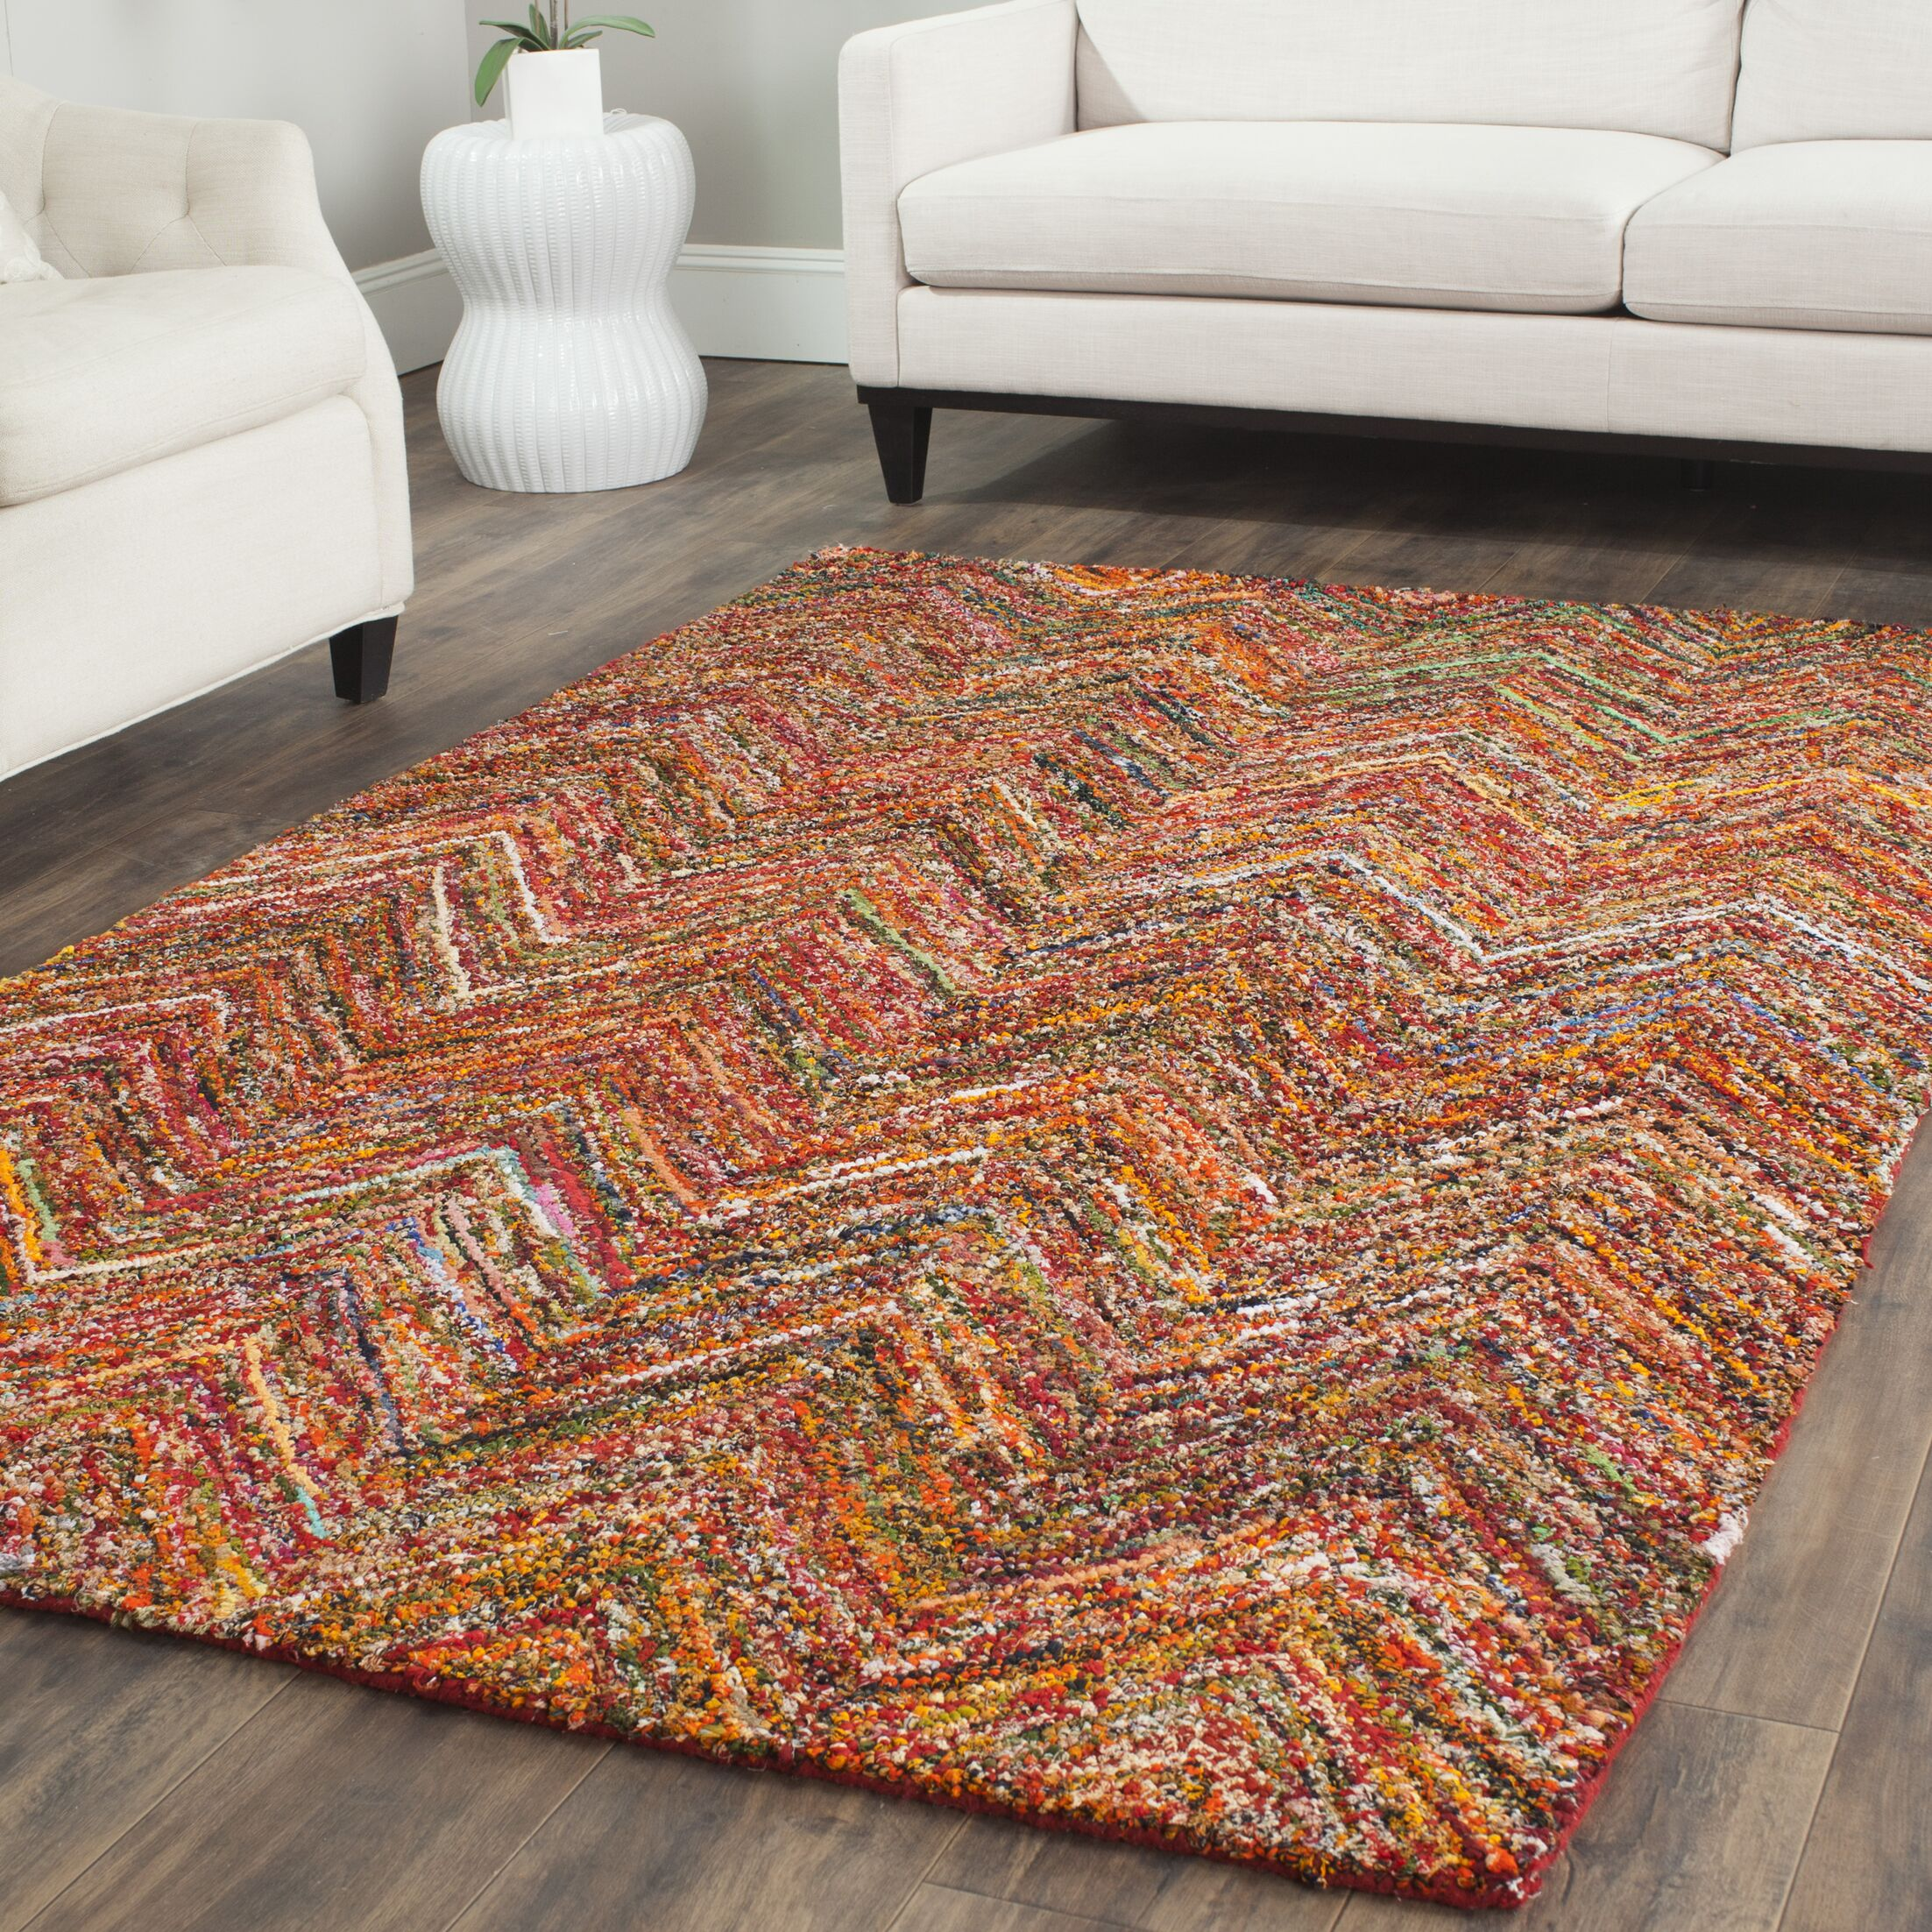 Sergio Hand-Tufted Multi Area Rug Rug Size: Rectangle 5' x 8'